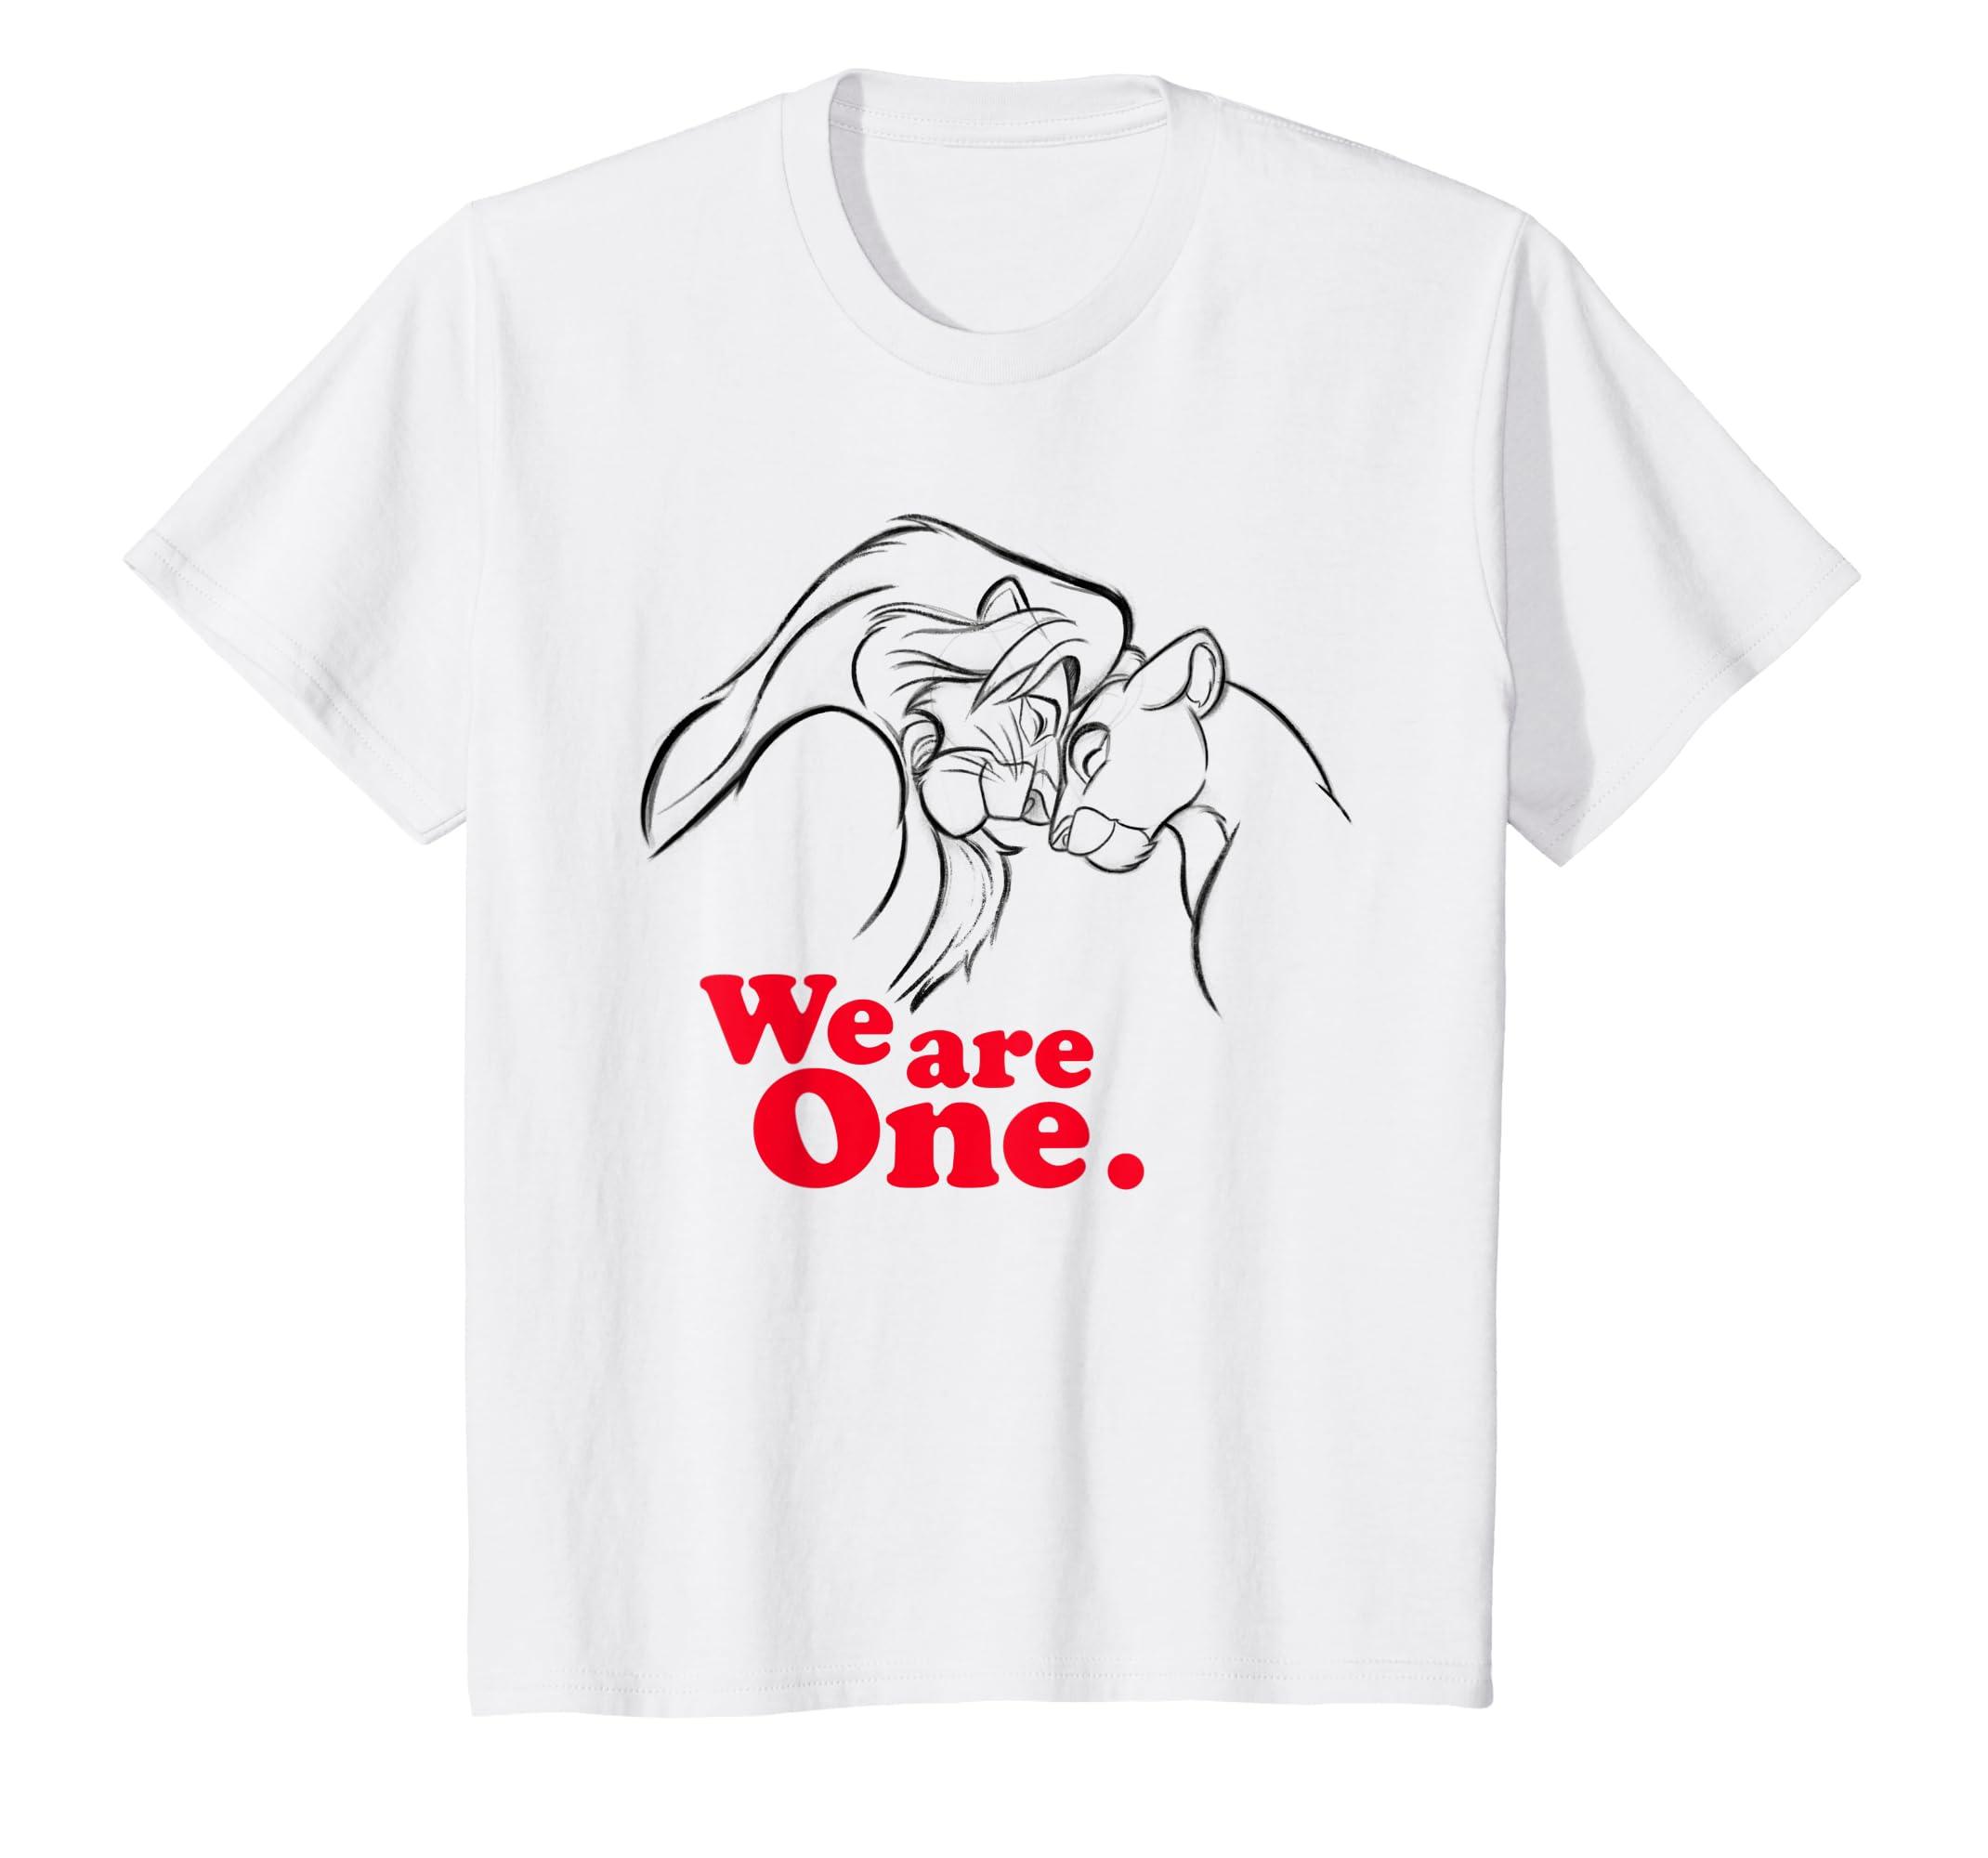 e6b30313b Amazon.com: Disney Lion King Simba and Nala We are One Love T-Shirt:  Clothing